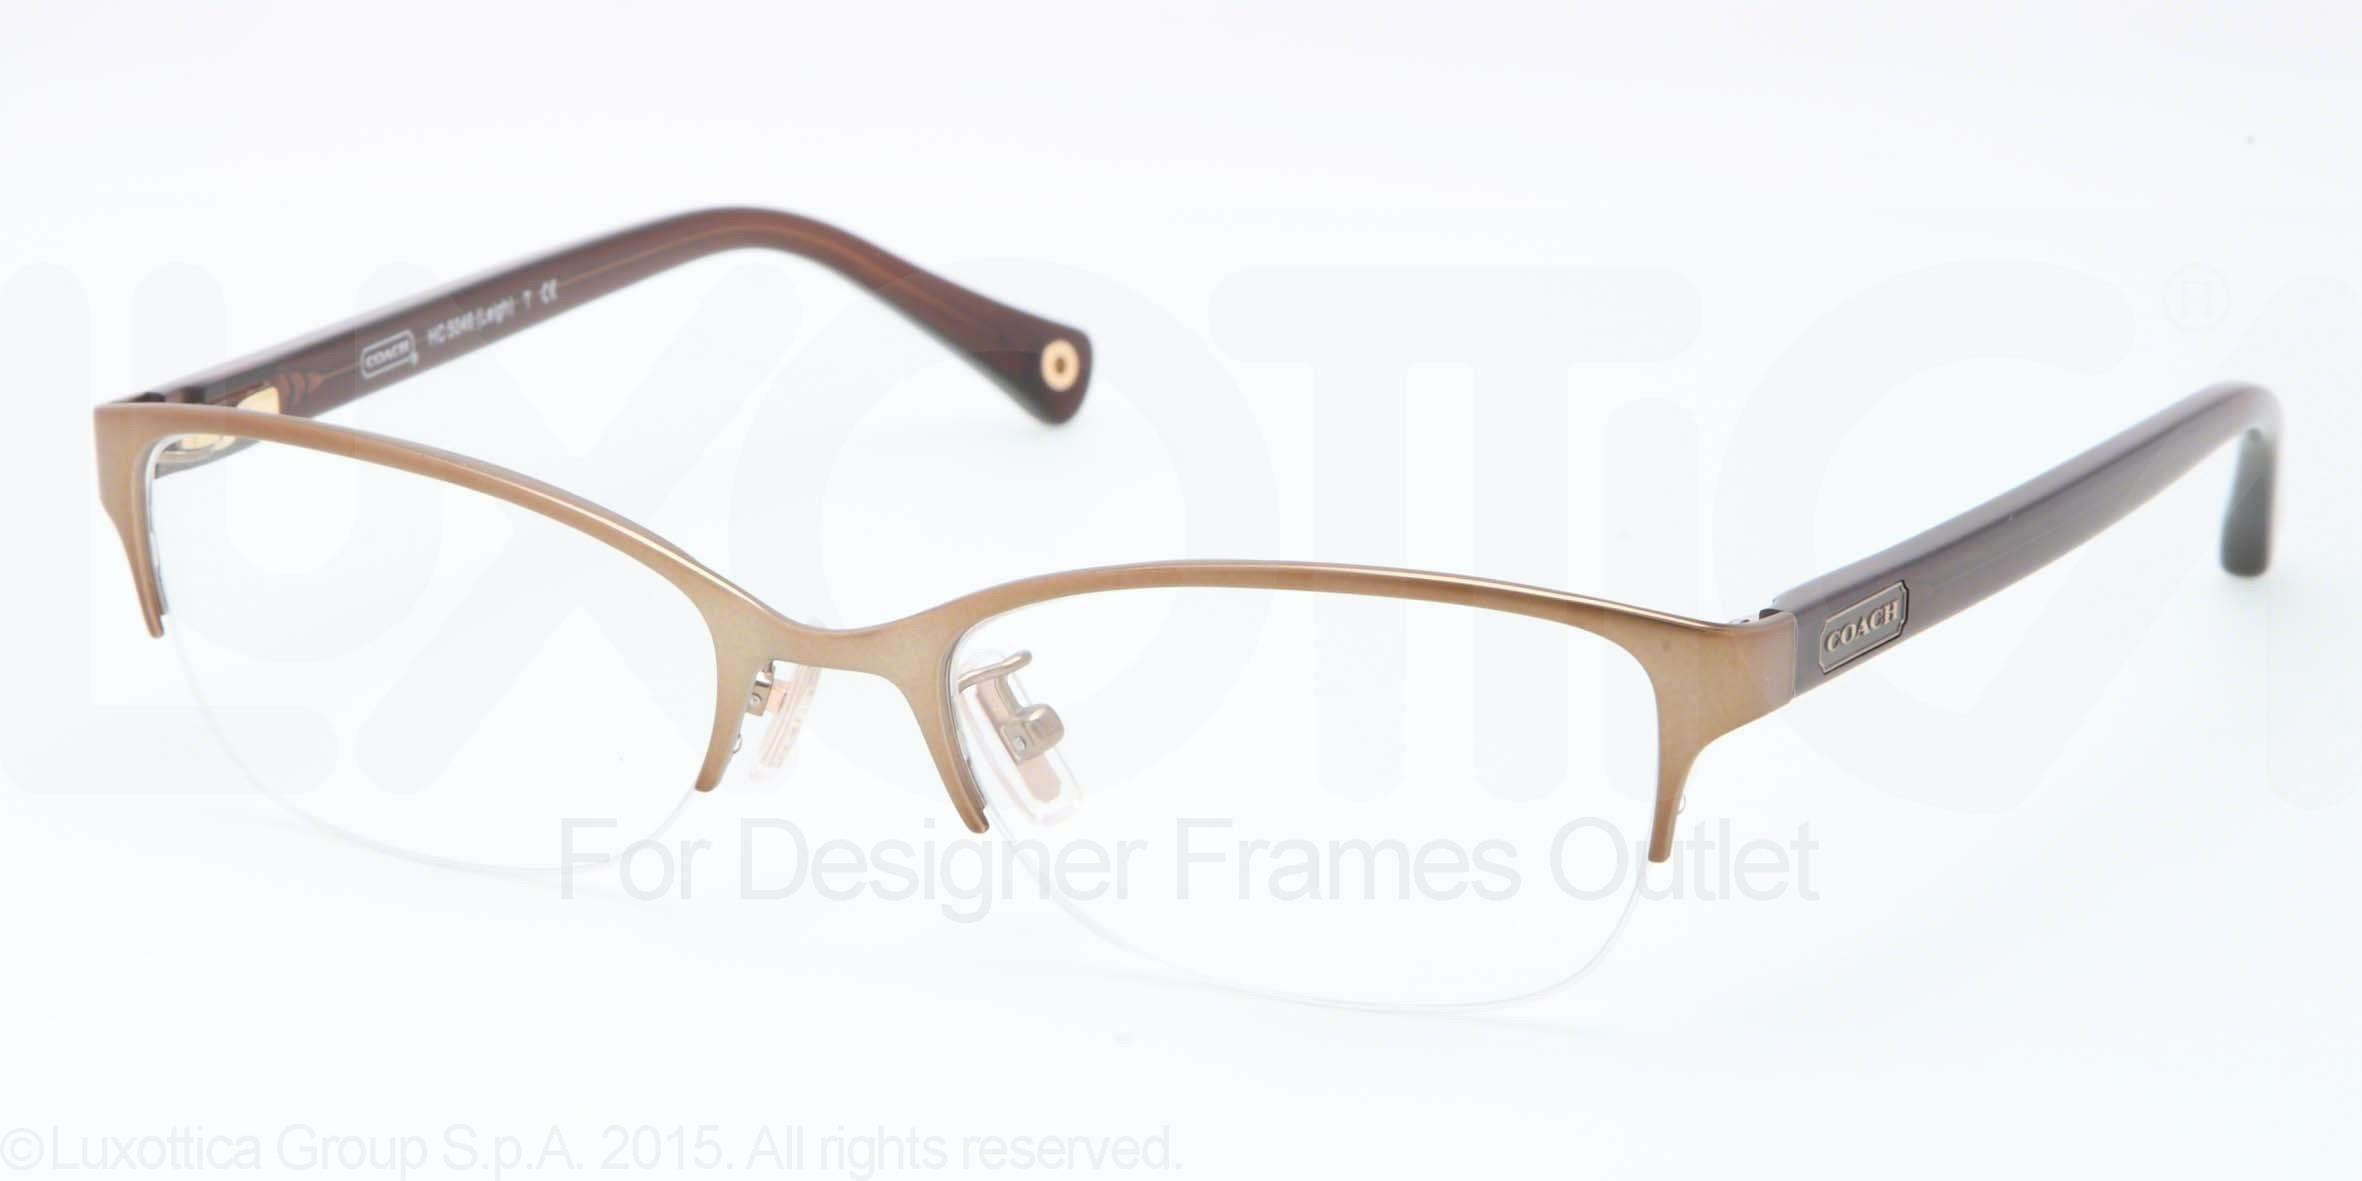 847a4bb9dc Coach - Designer Frames Outlet